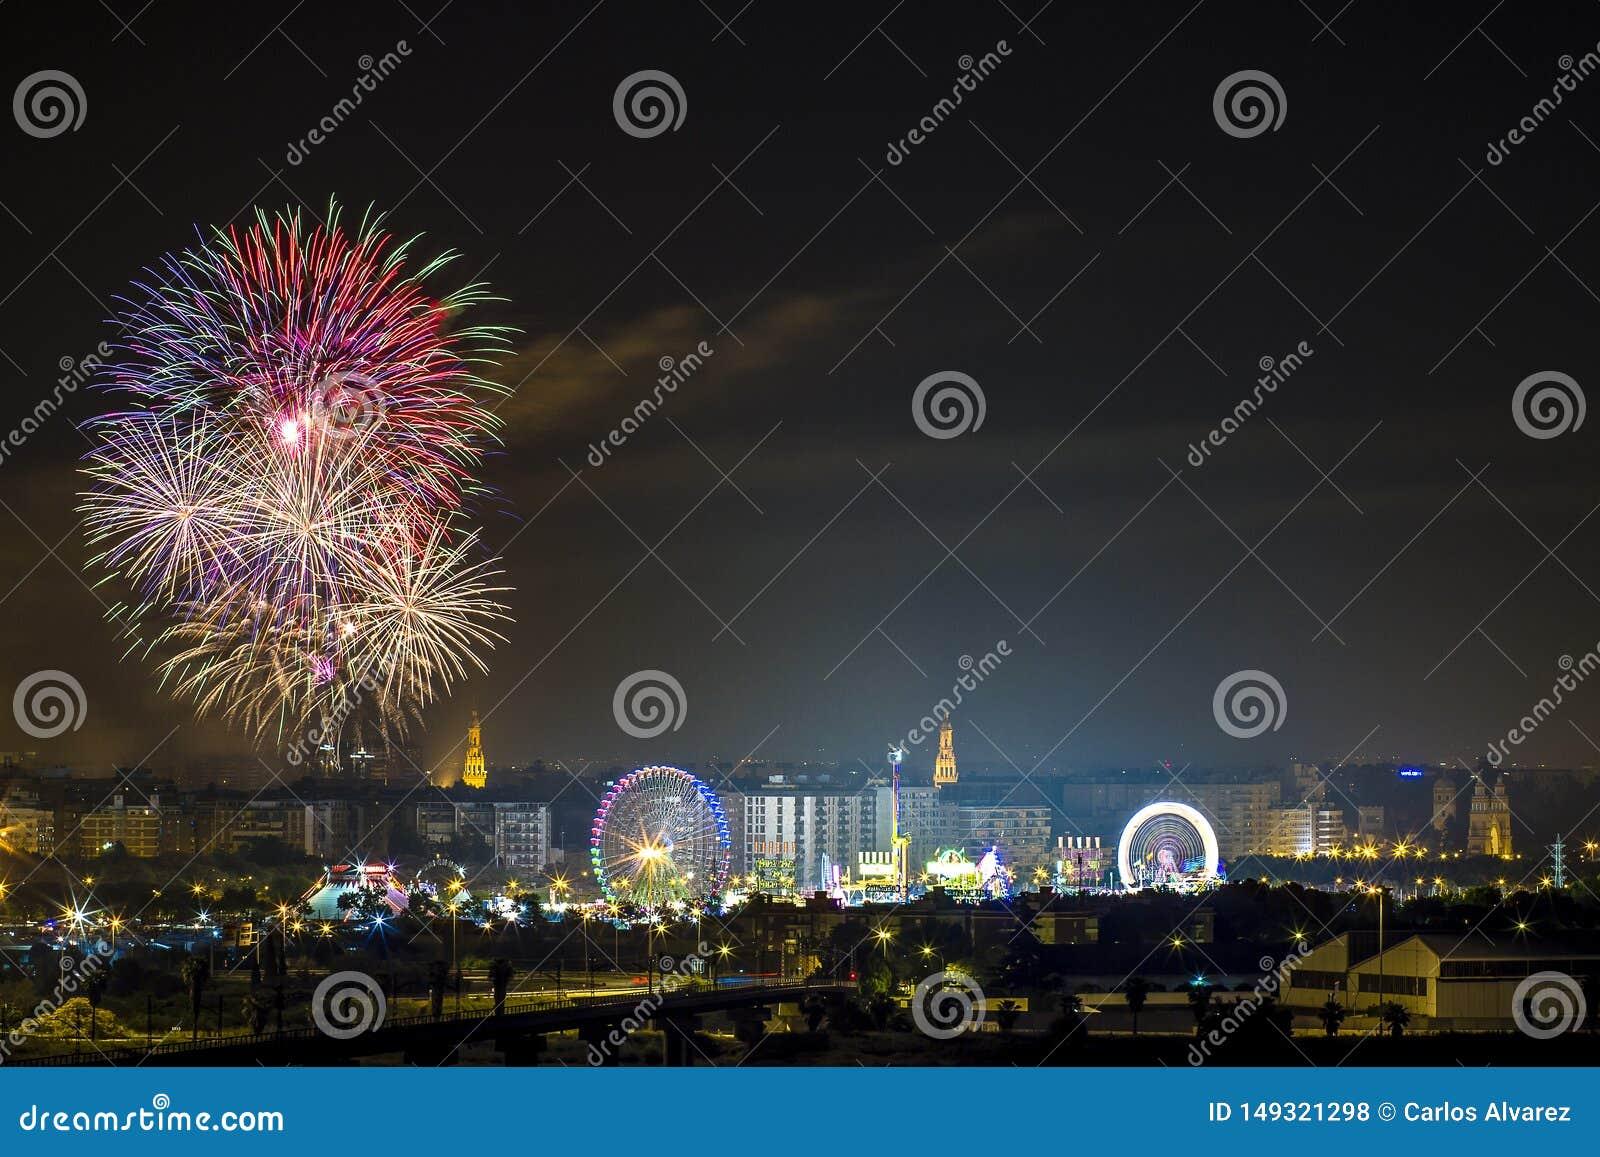 Fireworks parties